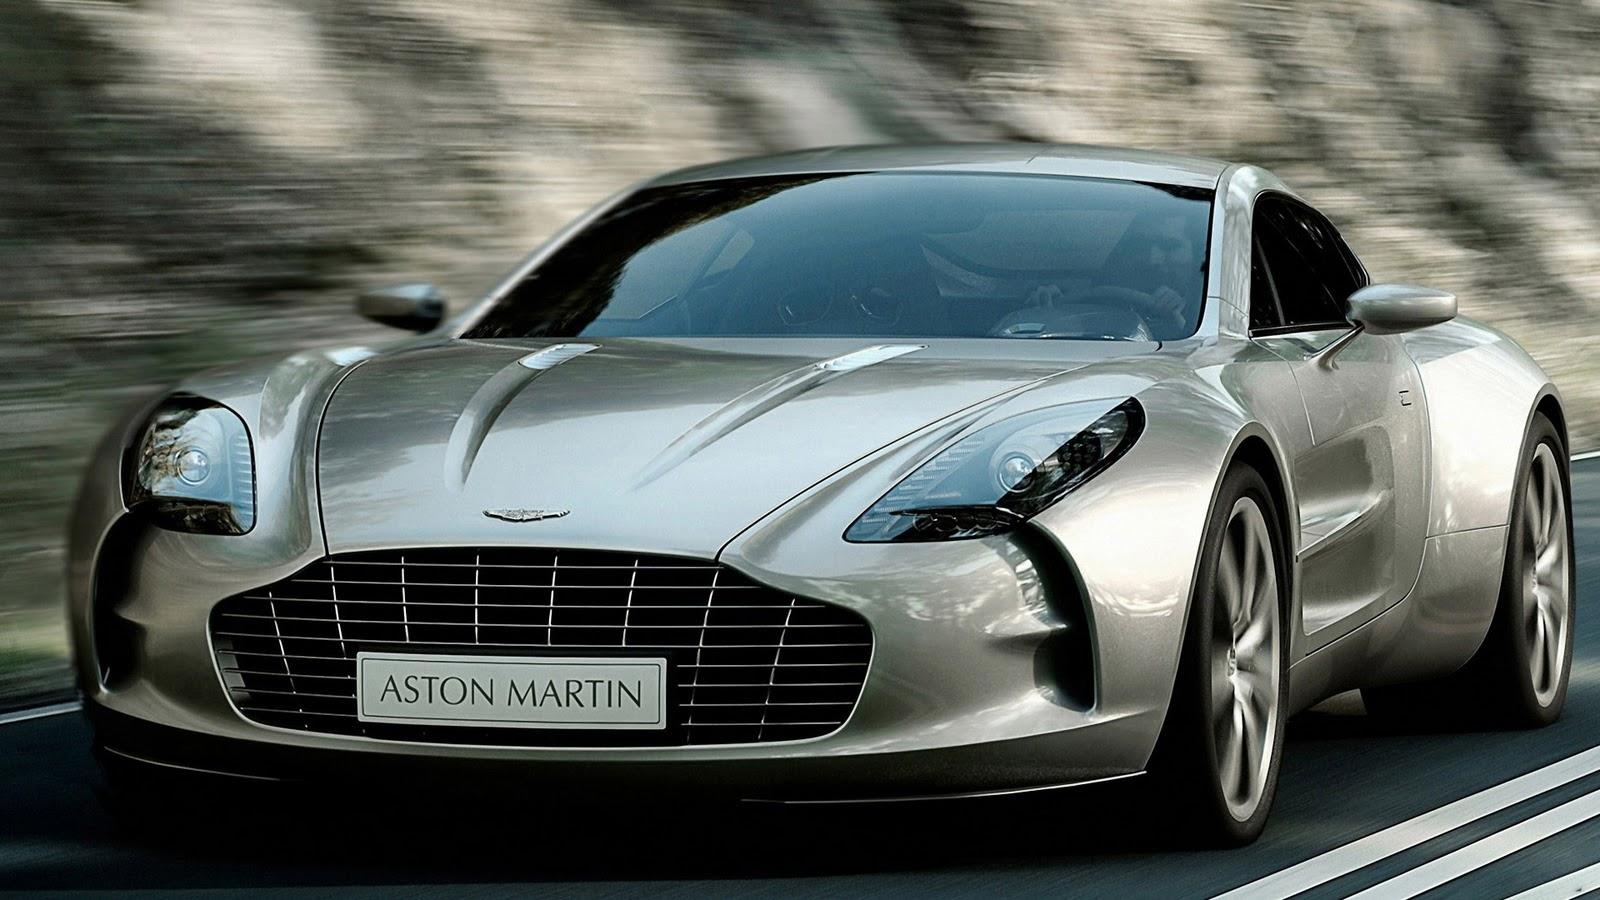 Aston Martin Car || Top Wallpapers Download .blogspot.com